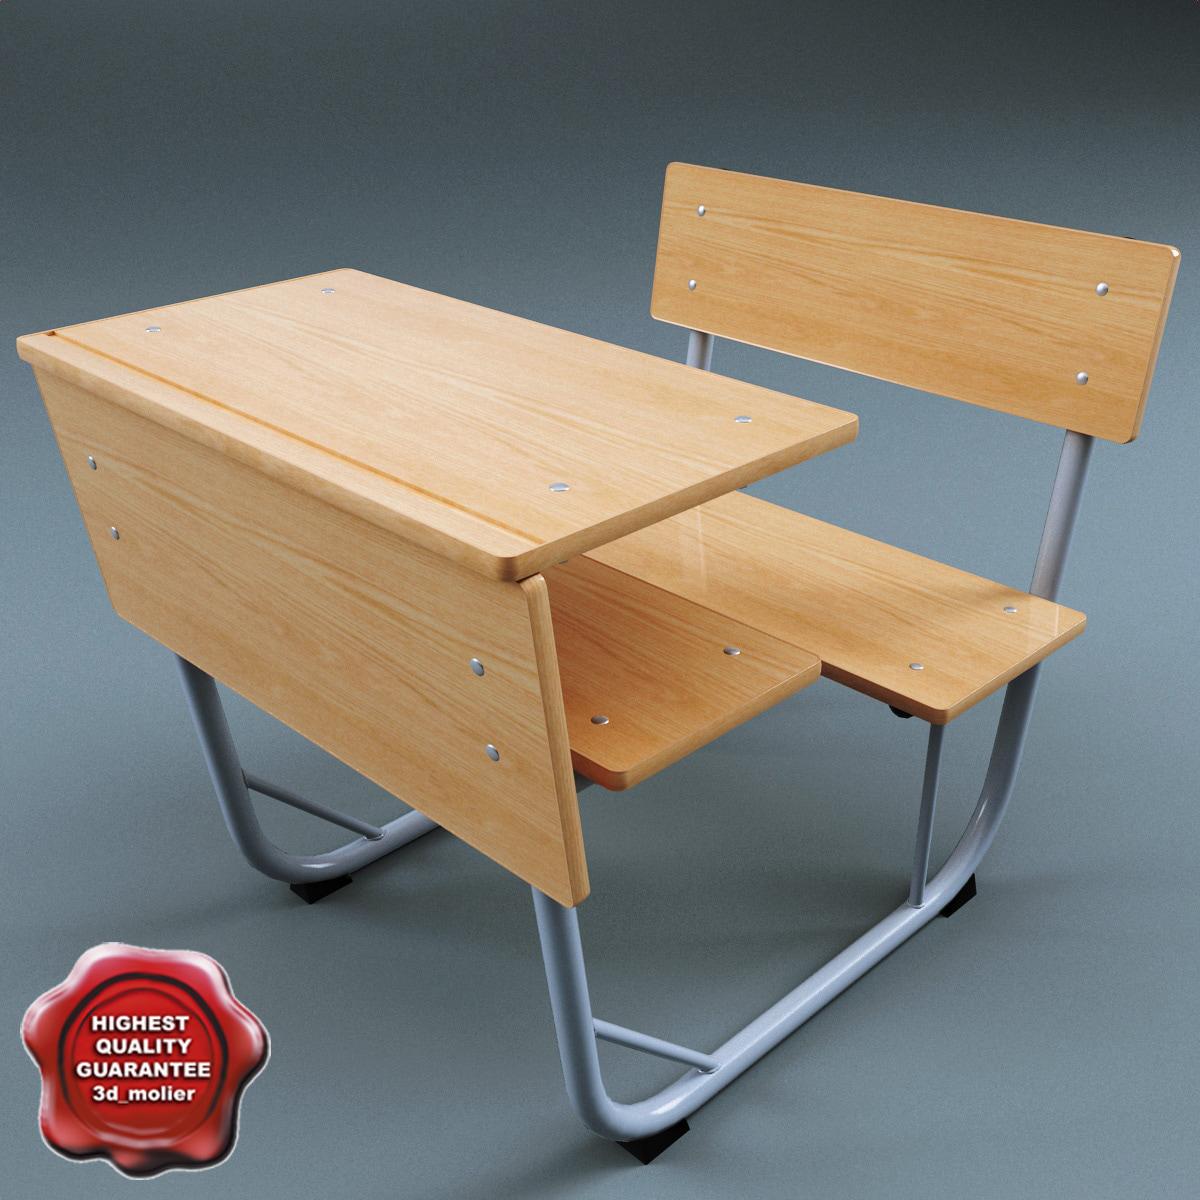 School_desk_V3_00.jpg